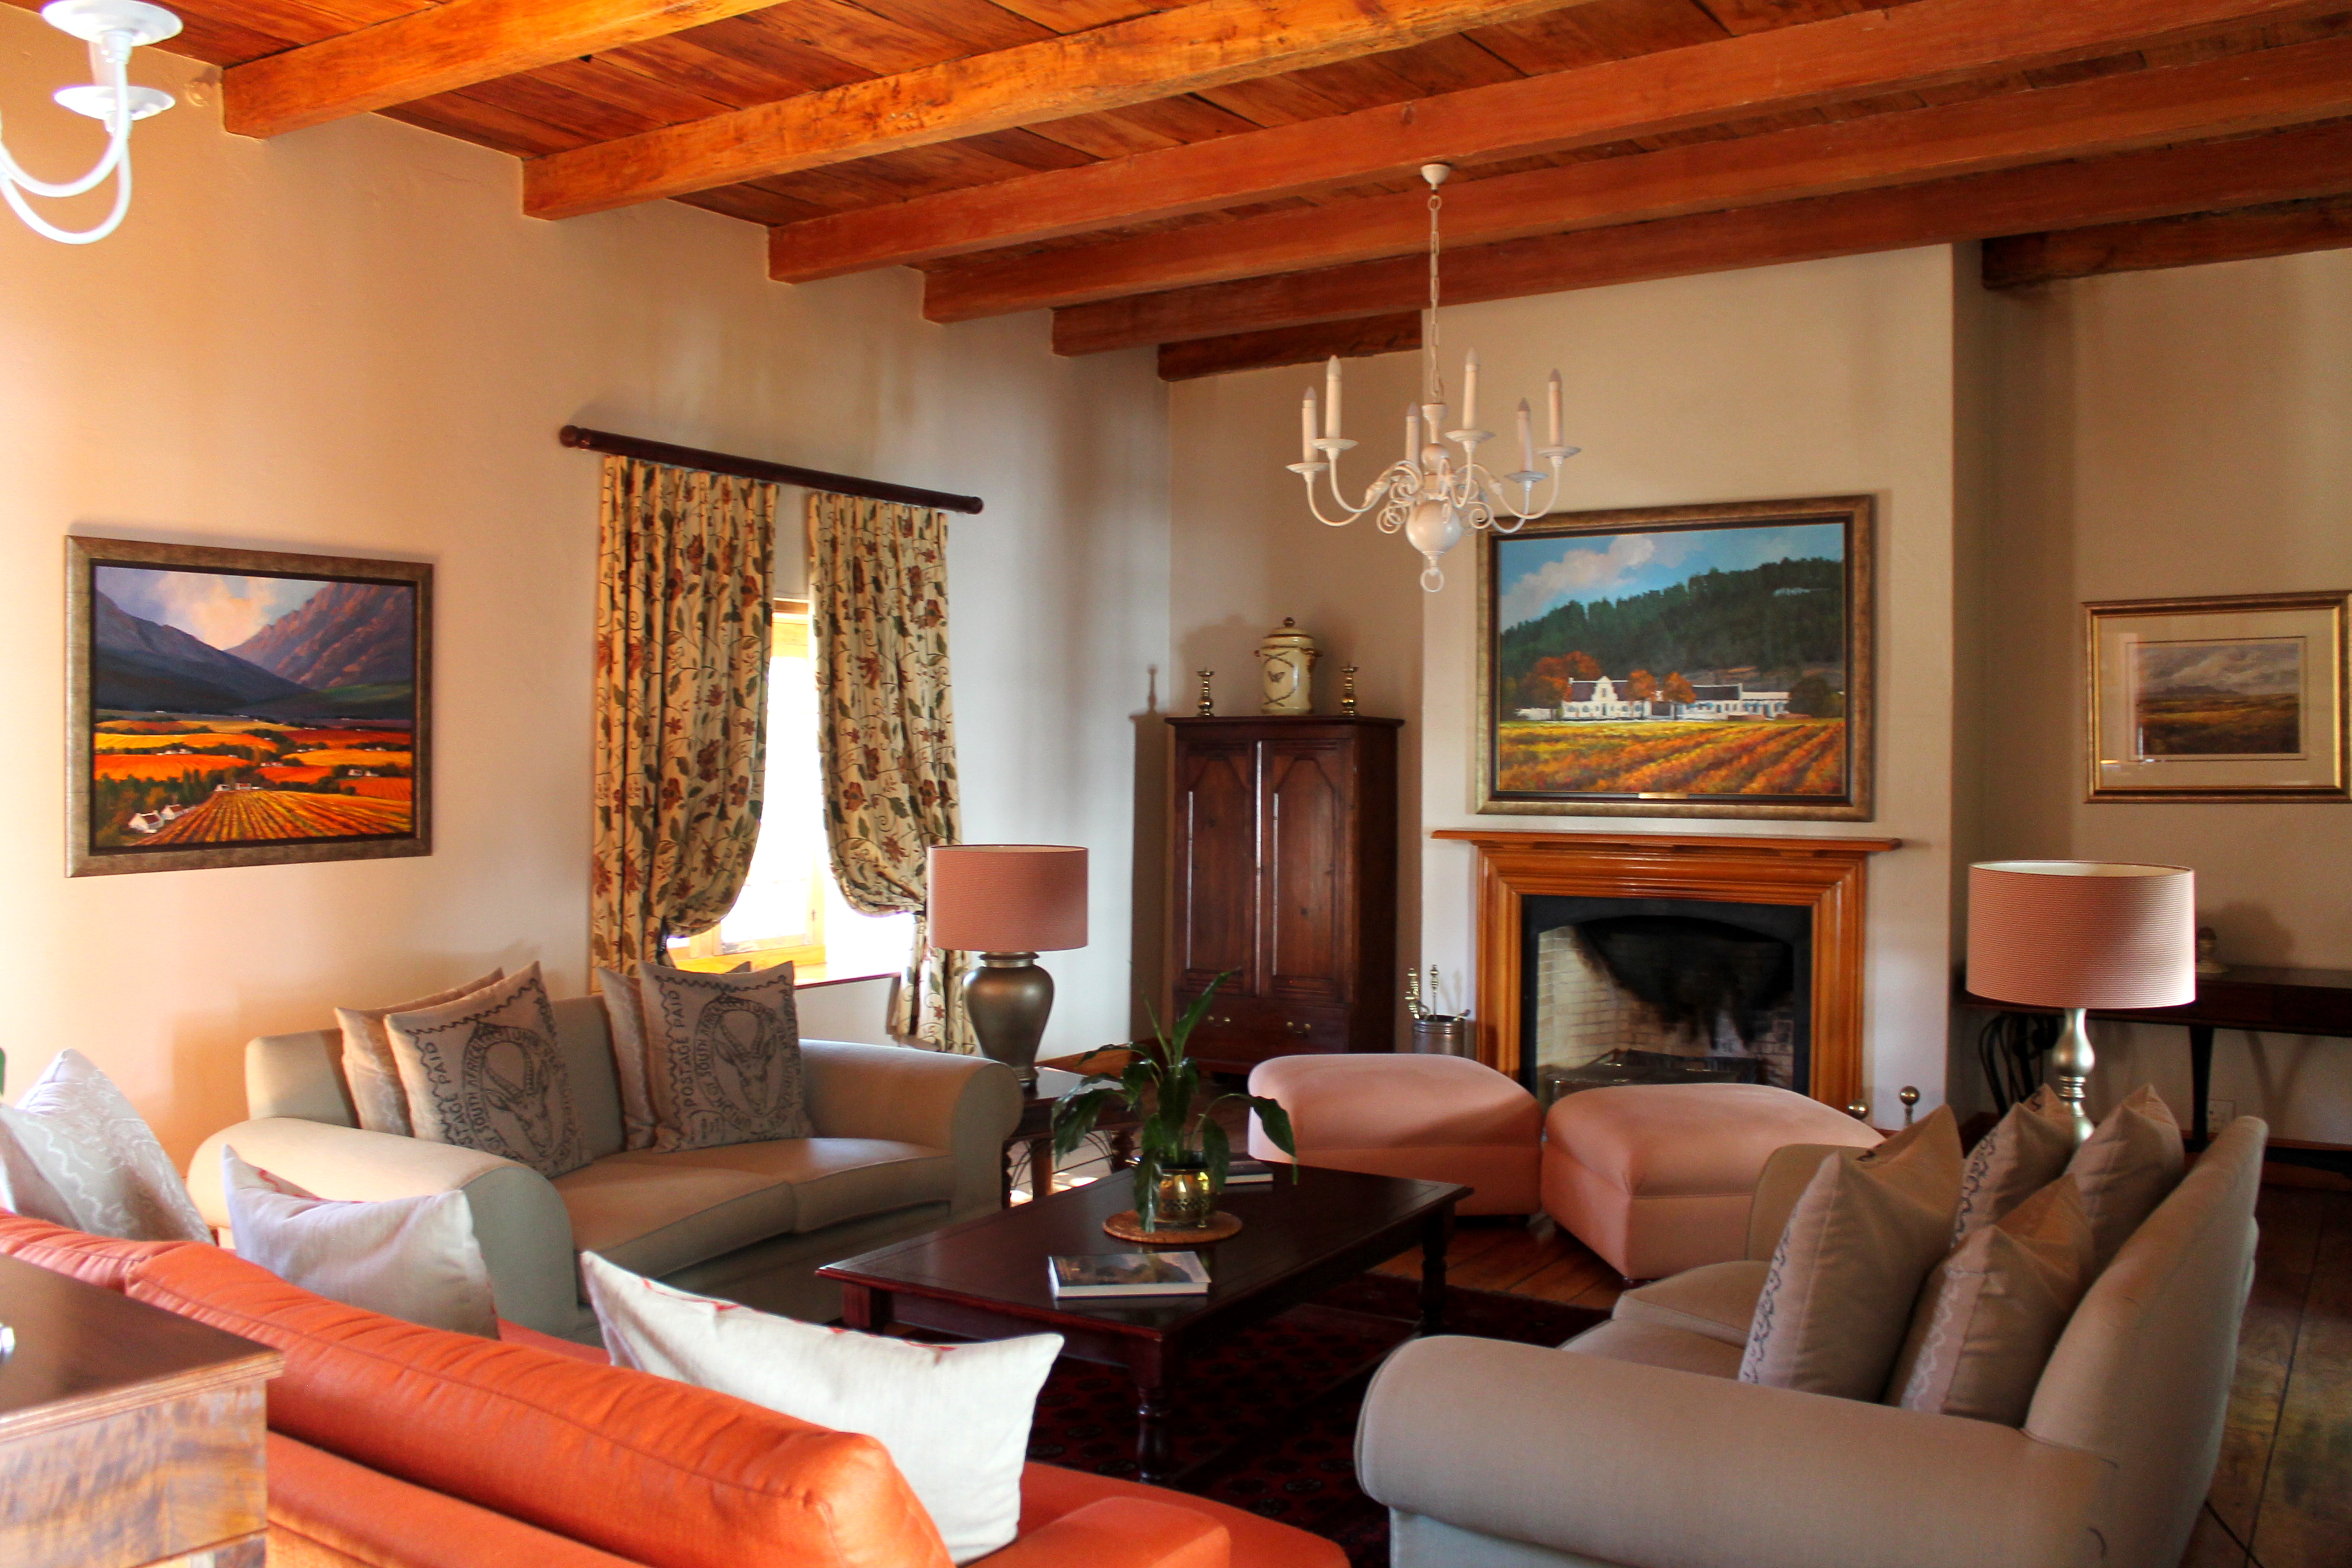 interior-rickety-bridge-winery-southasfrica-lustforthesblime